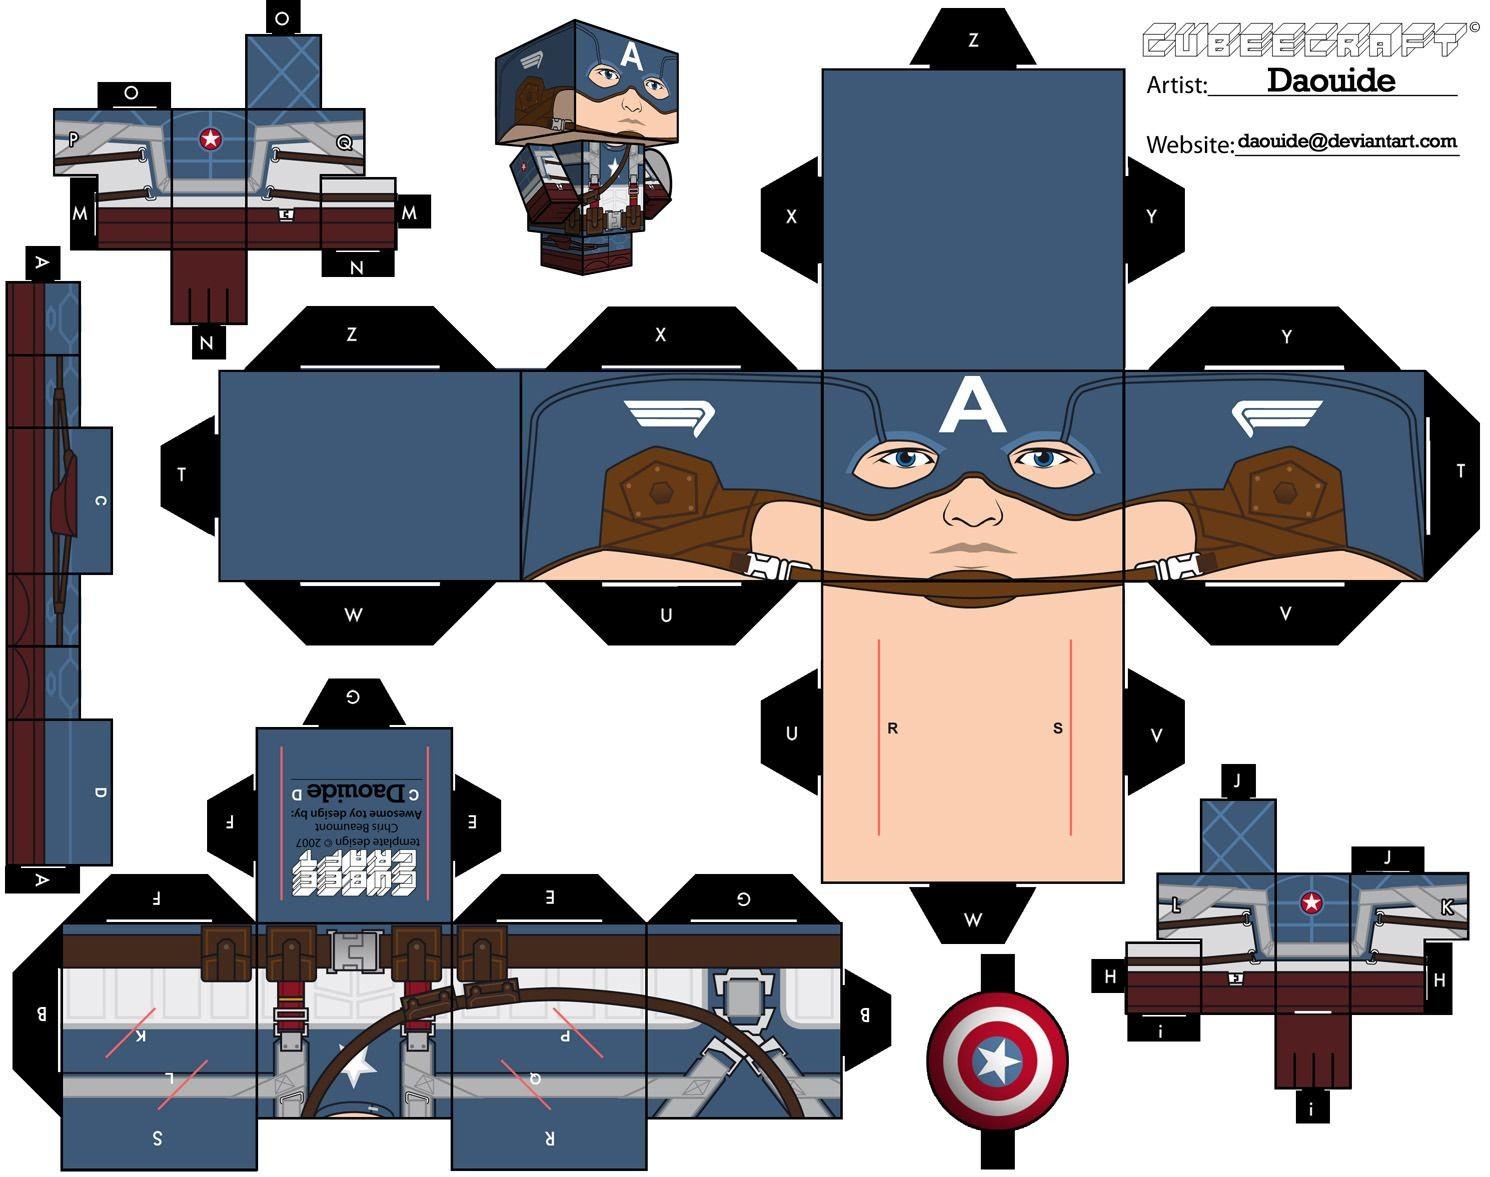 Death Note Papercraft Megapost] Papercraft Tus Personajes Preferidos En Papel